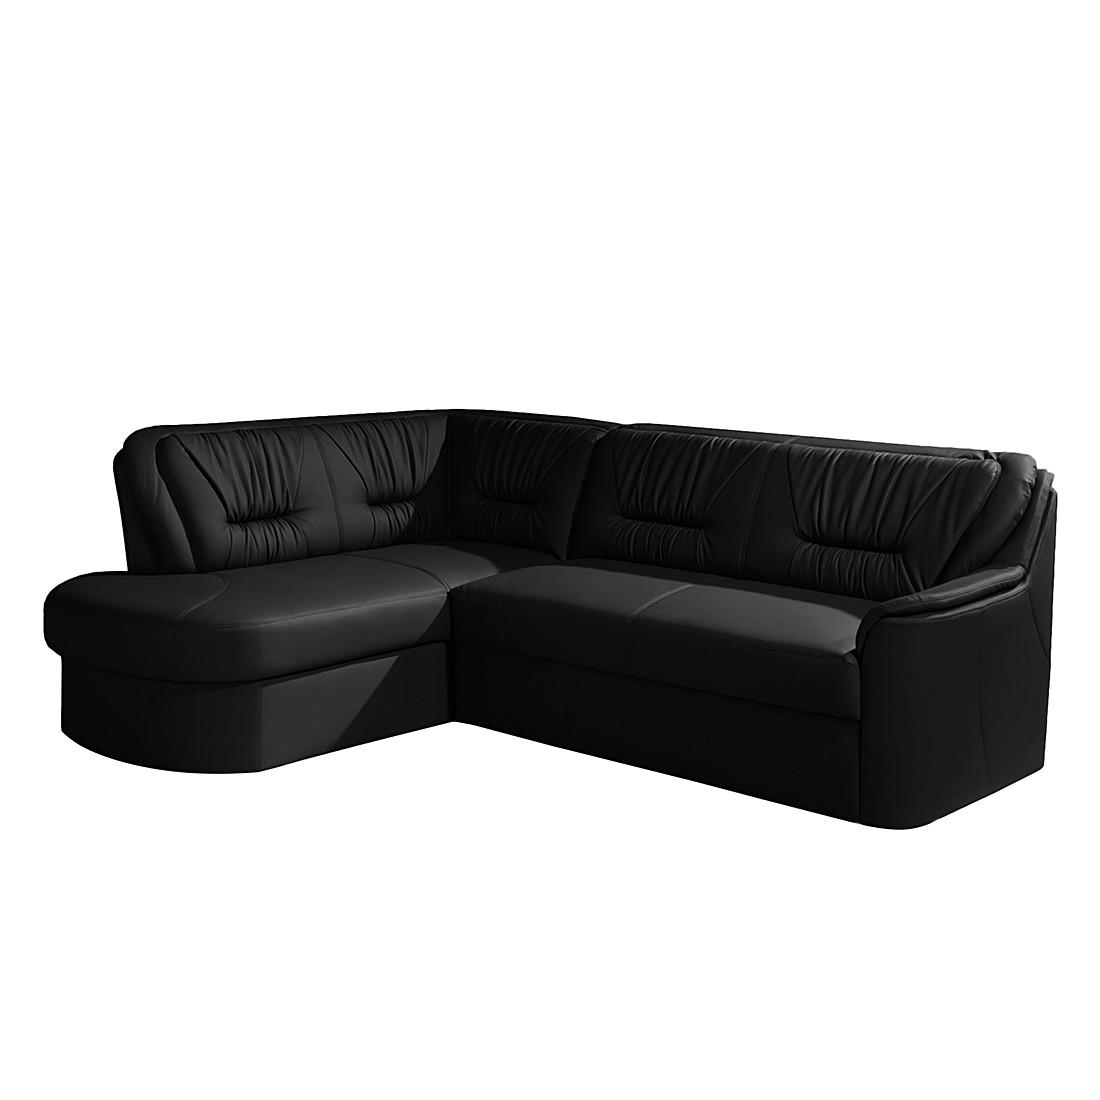 ecksofa cartagena mit schlaffunktion kunstleder schwarz ottomane davorstehend links. Black Bedroom Furniture Sets. Home Design Ideas